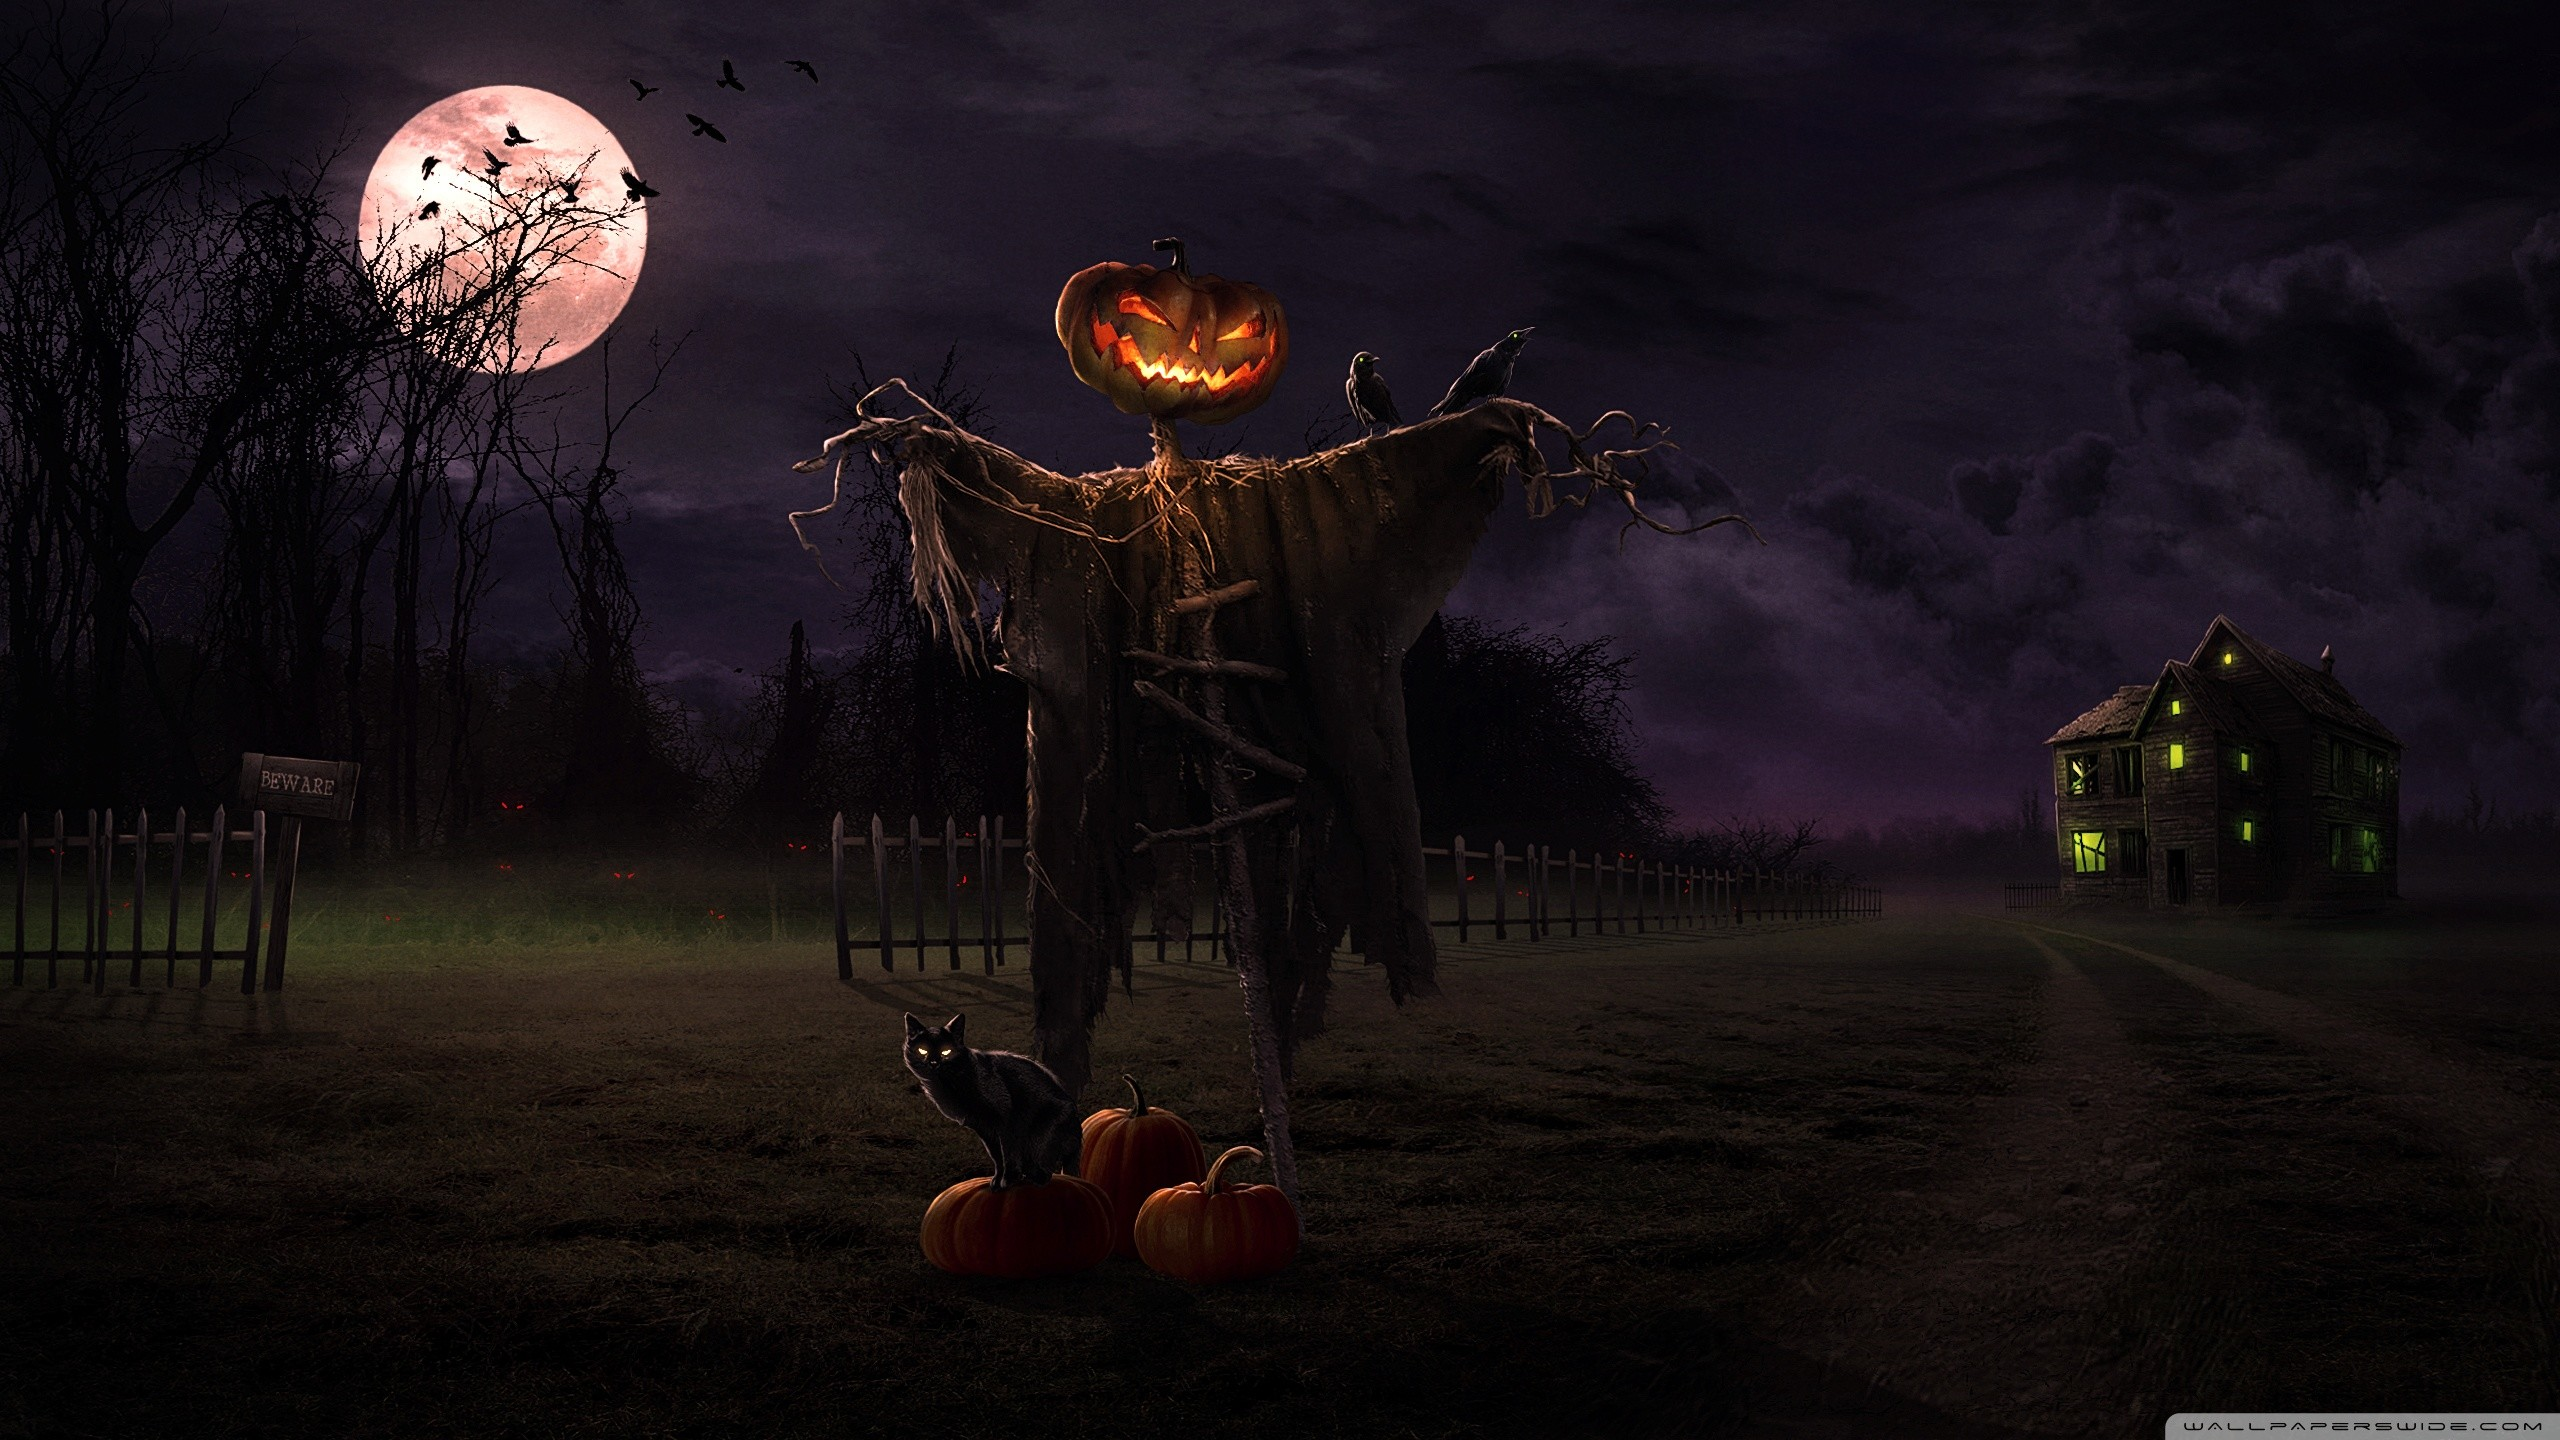 Spooky Path HD Wide Wallpaper for Widescreen